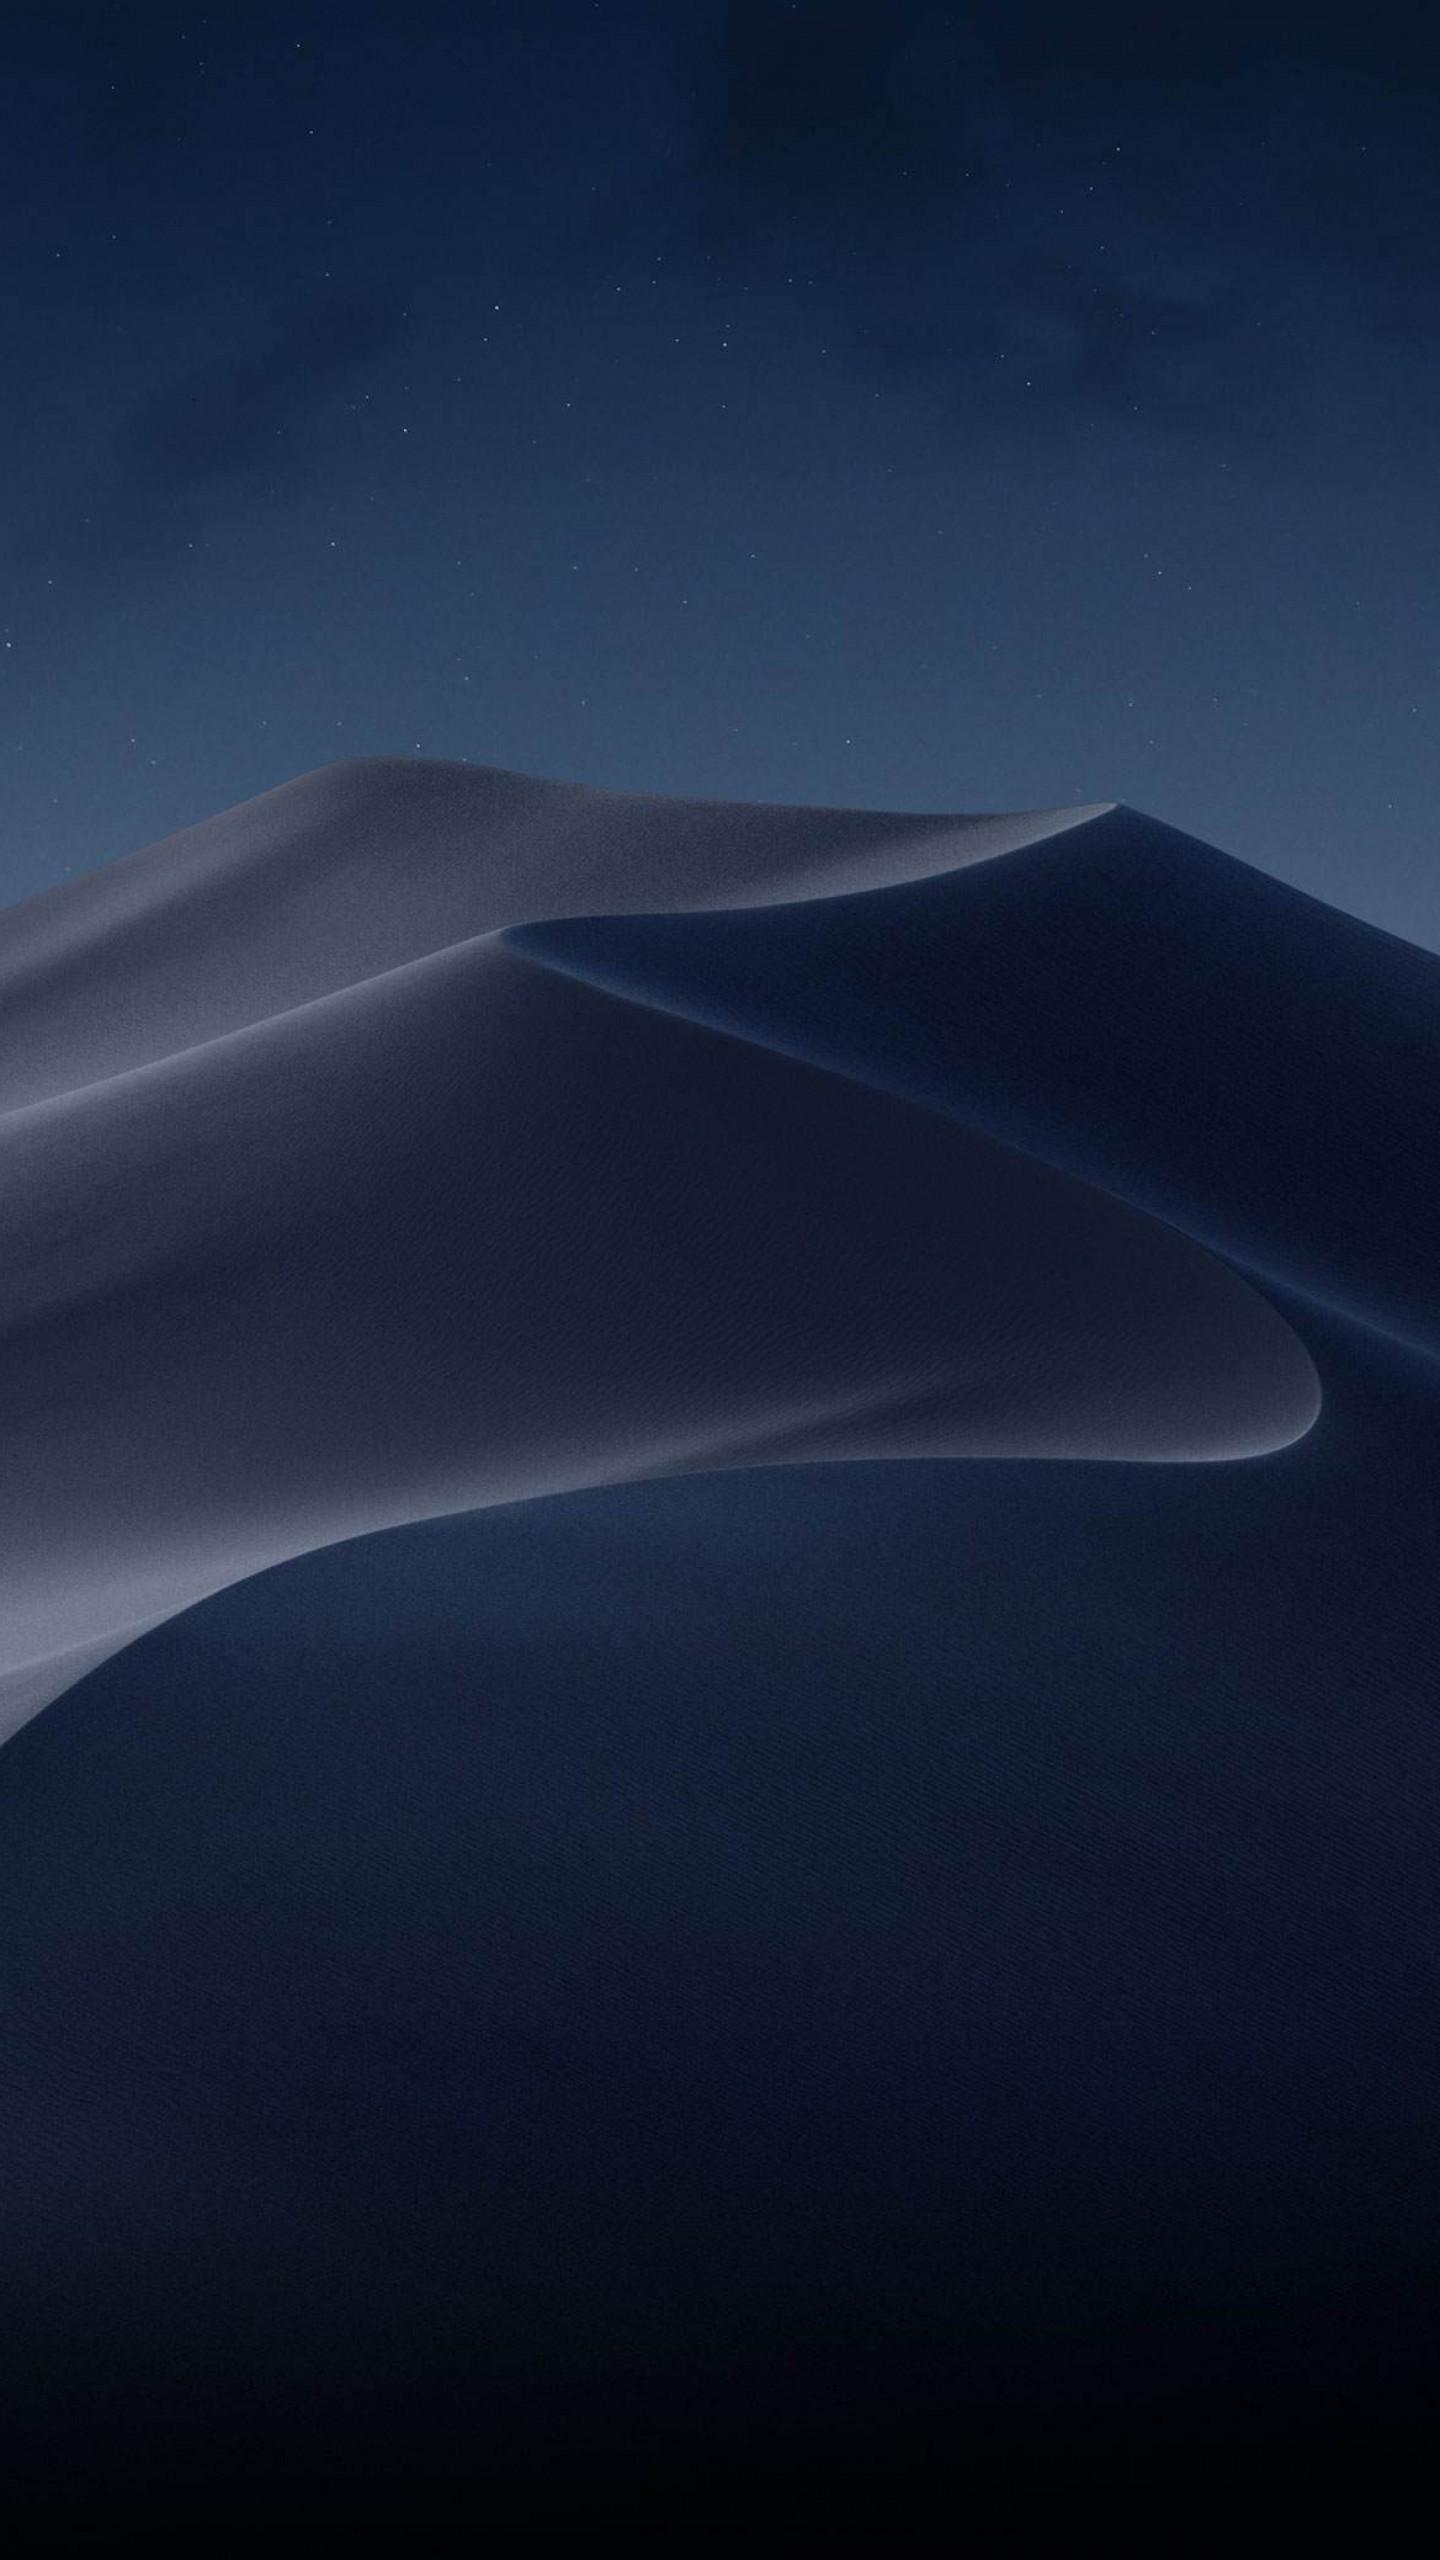 Wallpaper Macos Mojave Night Dunes Wwdc 2018 4k Os 18883